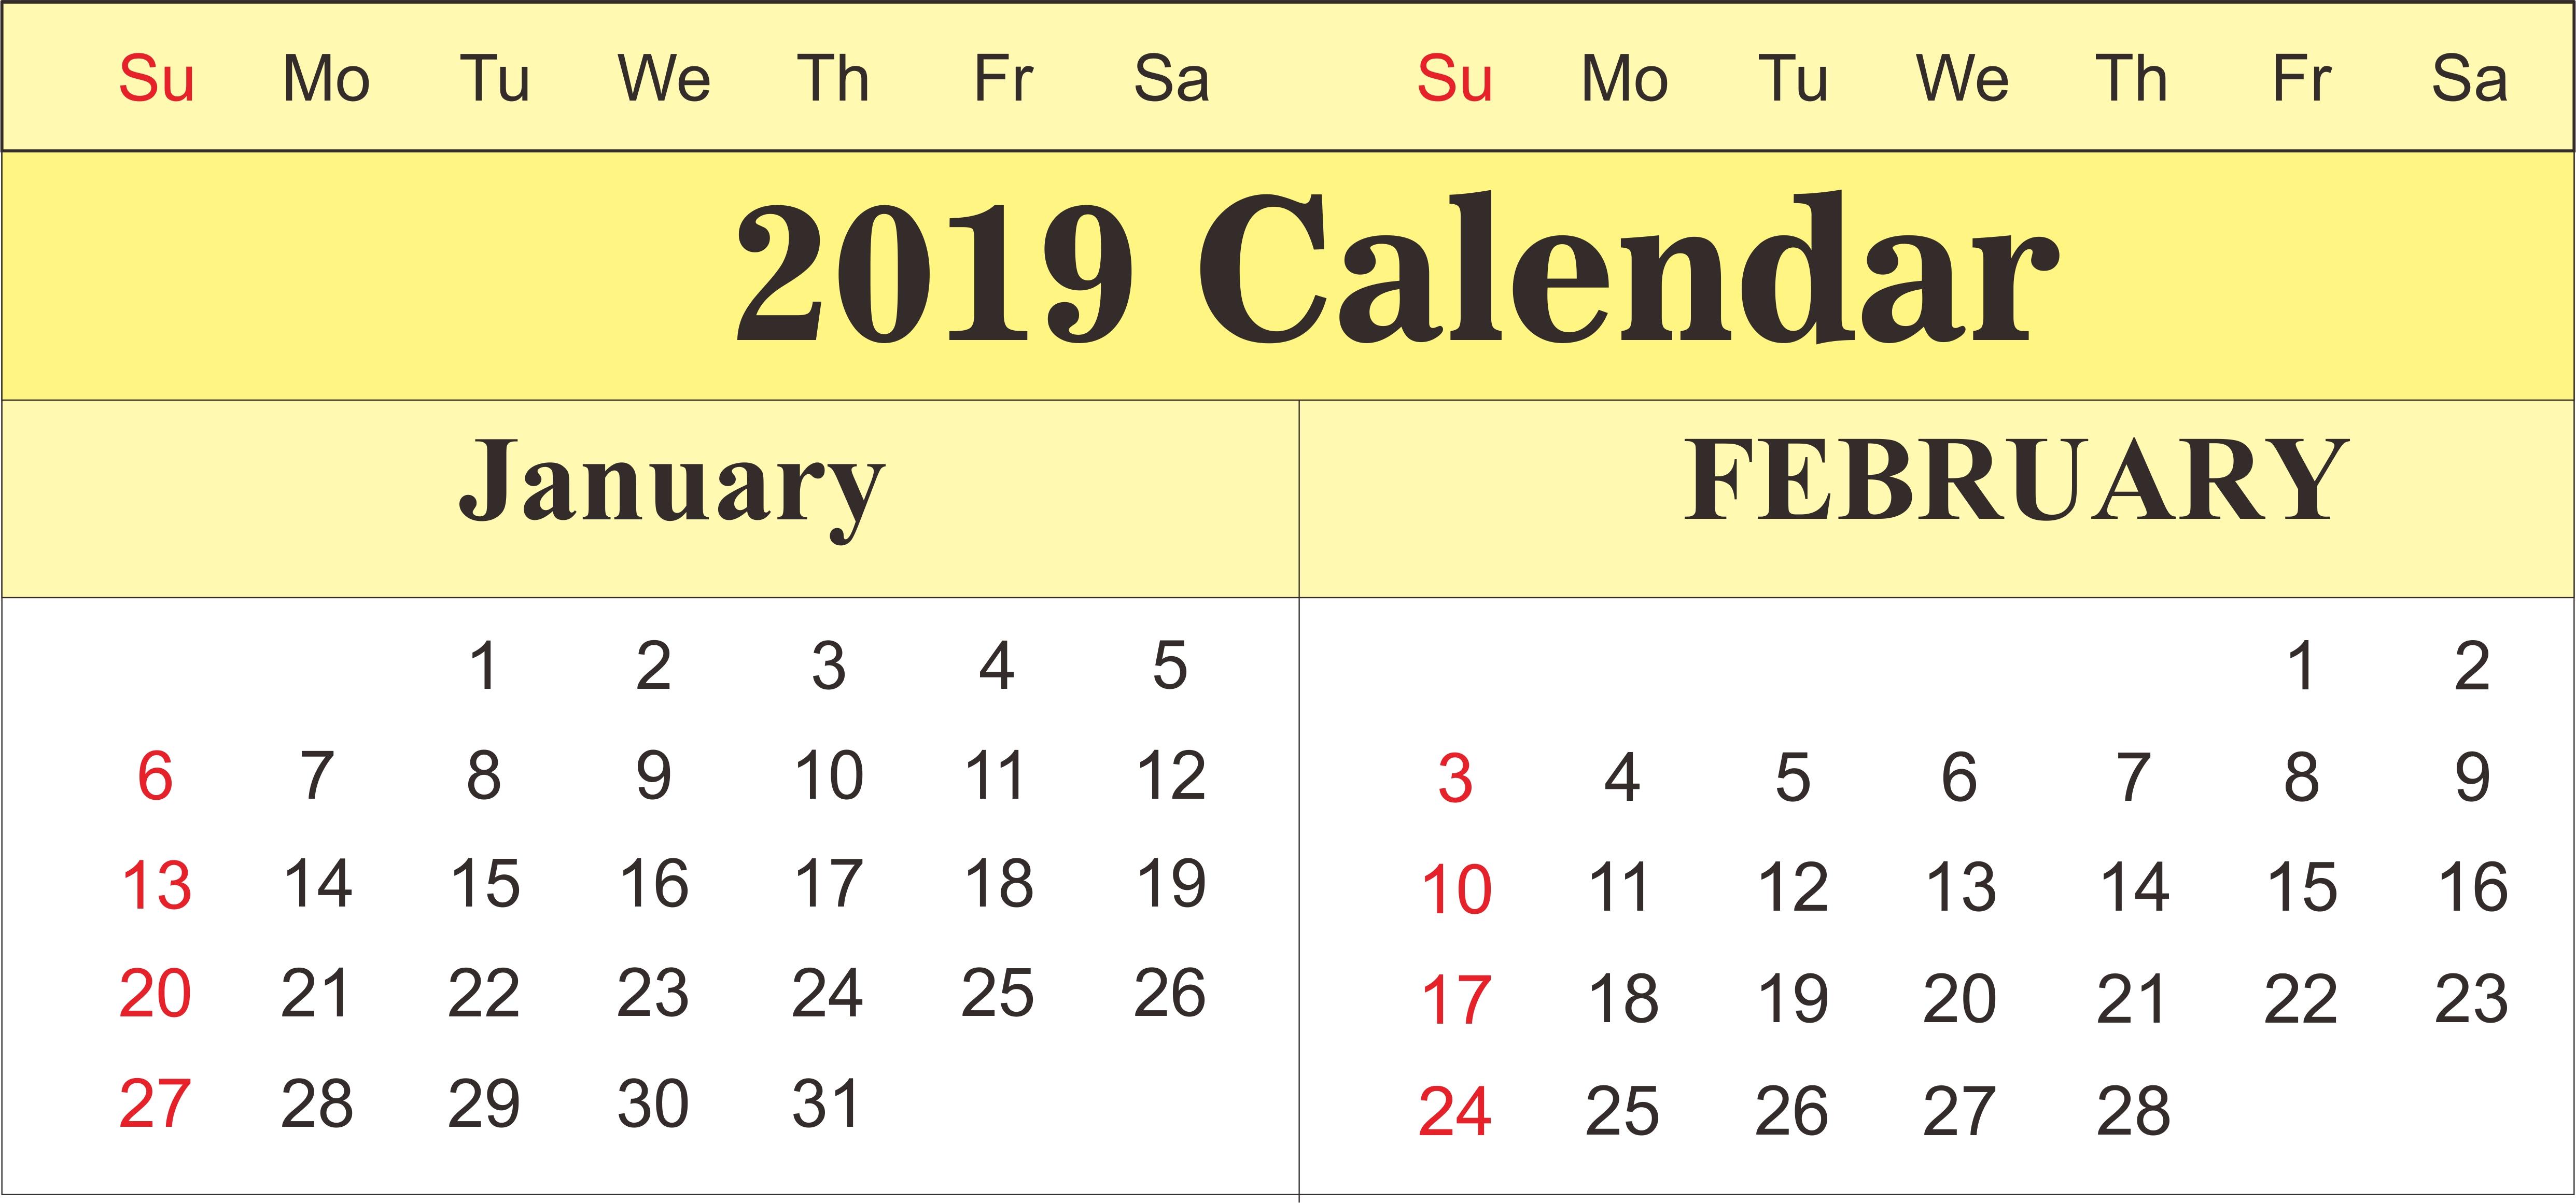 Get Free January And February 2019 Printable Calendar Templates January 7 2019 Calendar